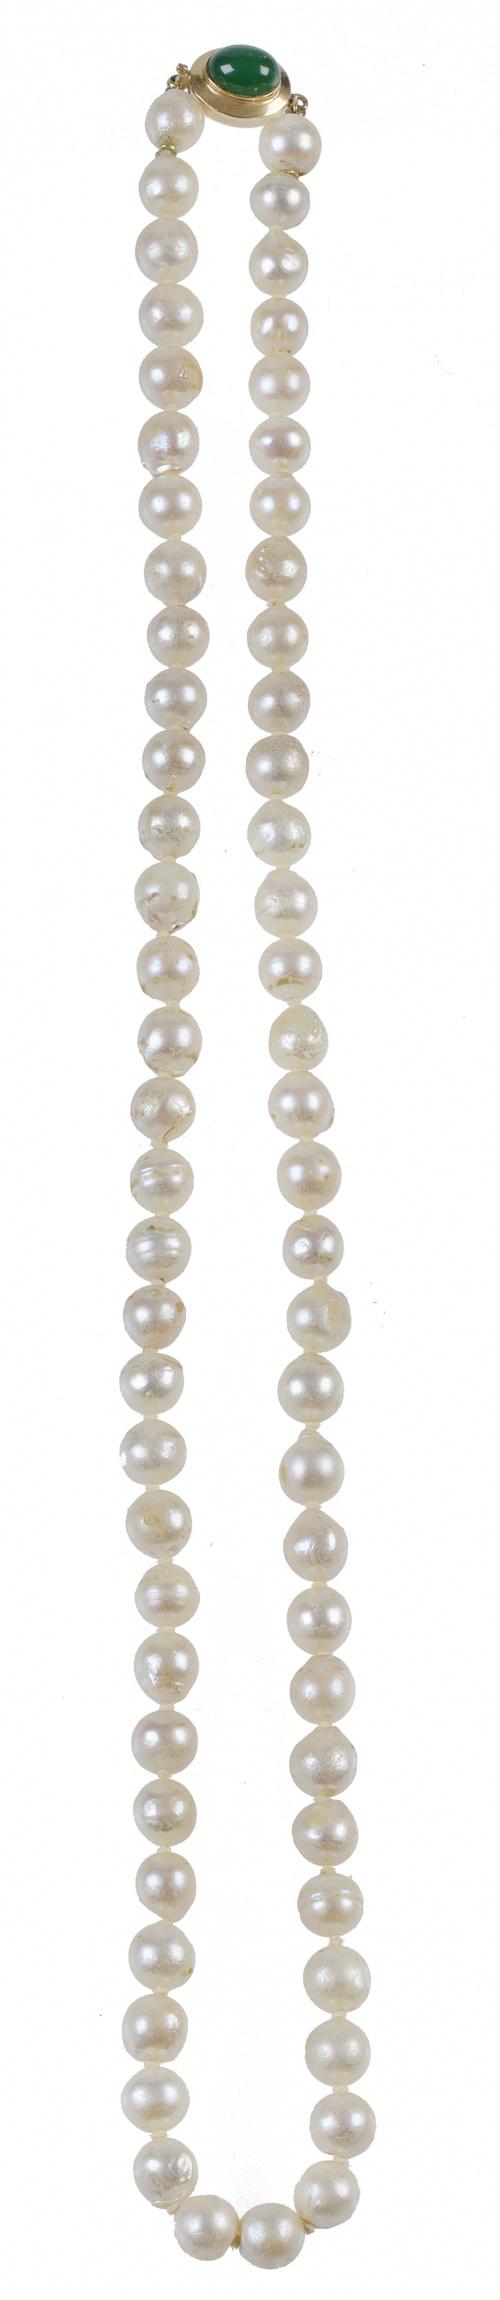 Collar de un hilo de perlas cultivadas de 8 mm de diámetro